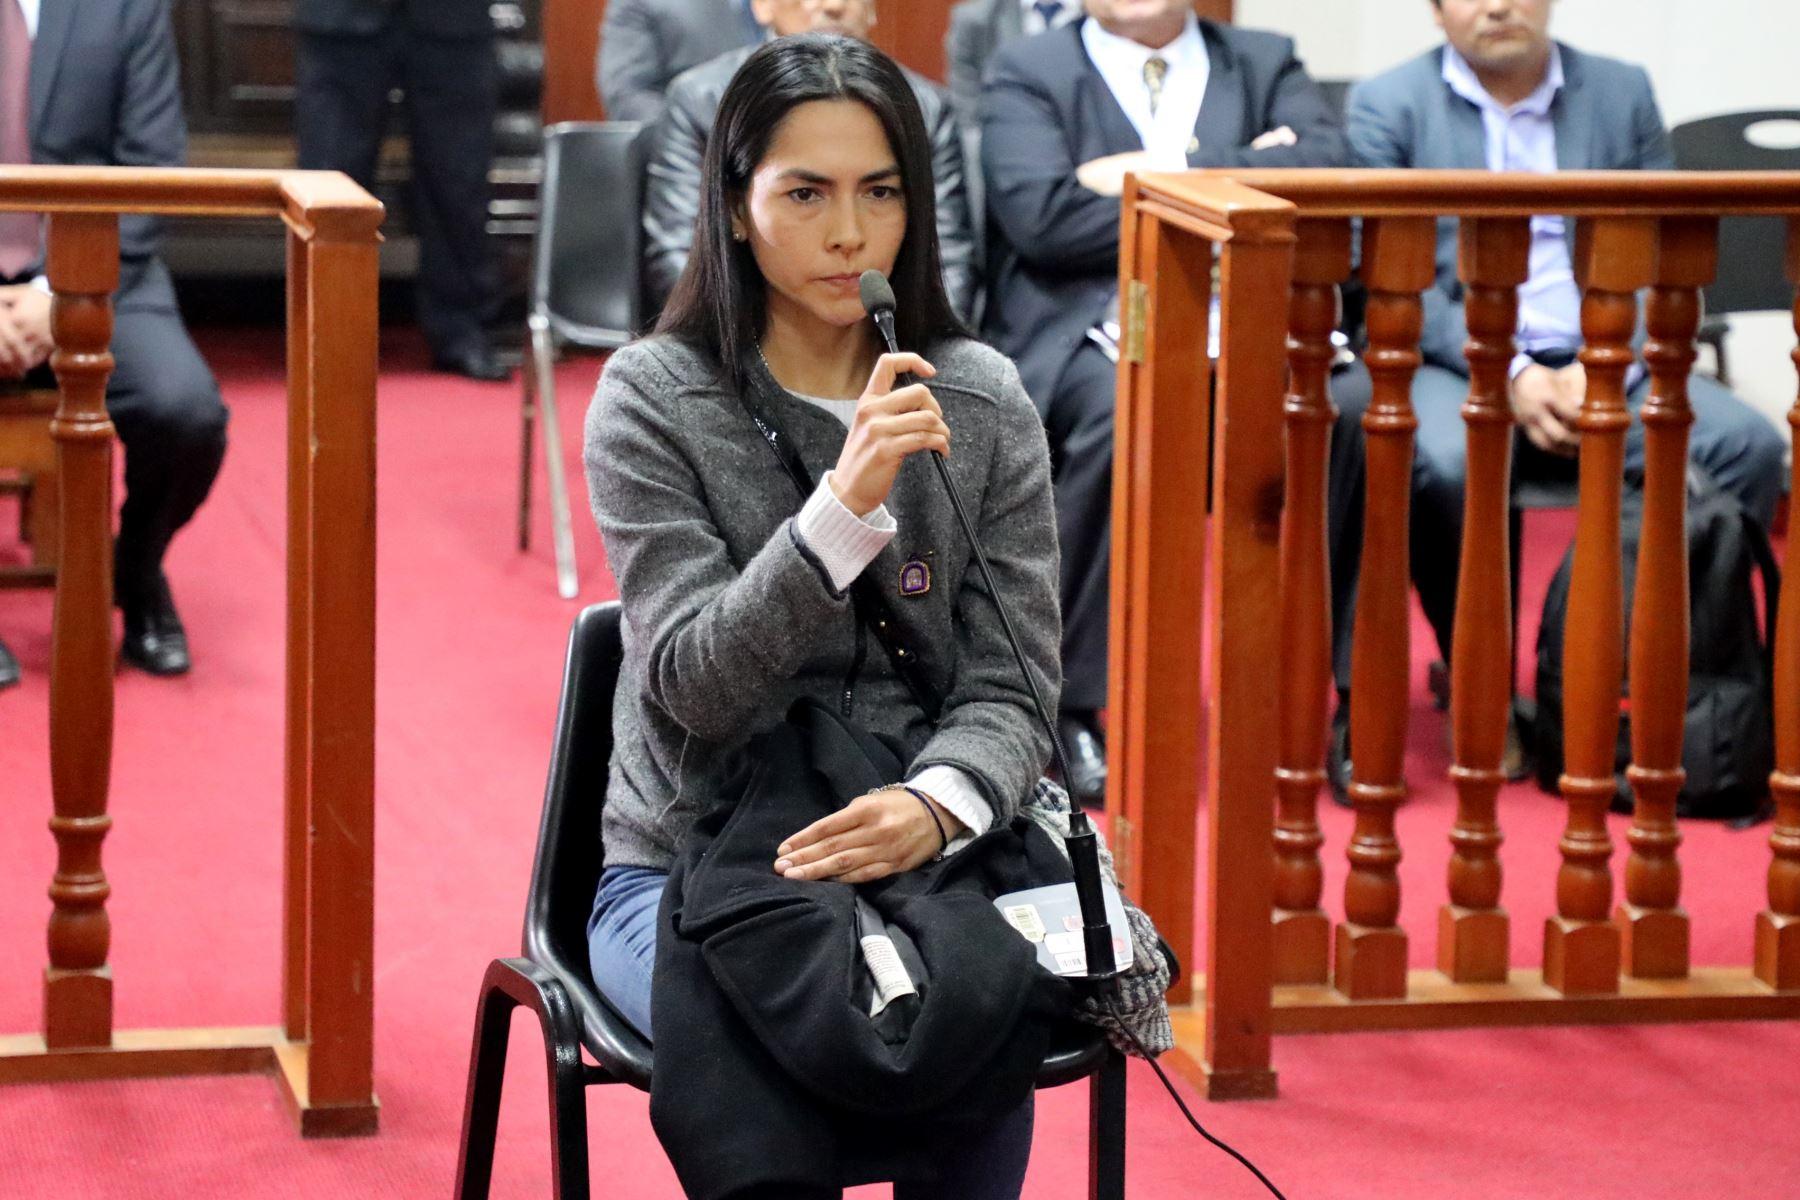 Audiencia para evaluar si Melisa González Gagliuffi recibe prisión preventiva. Foto: Poder Judicial